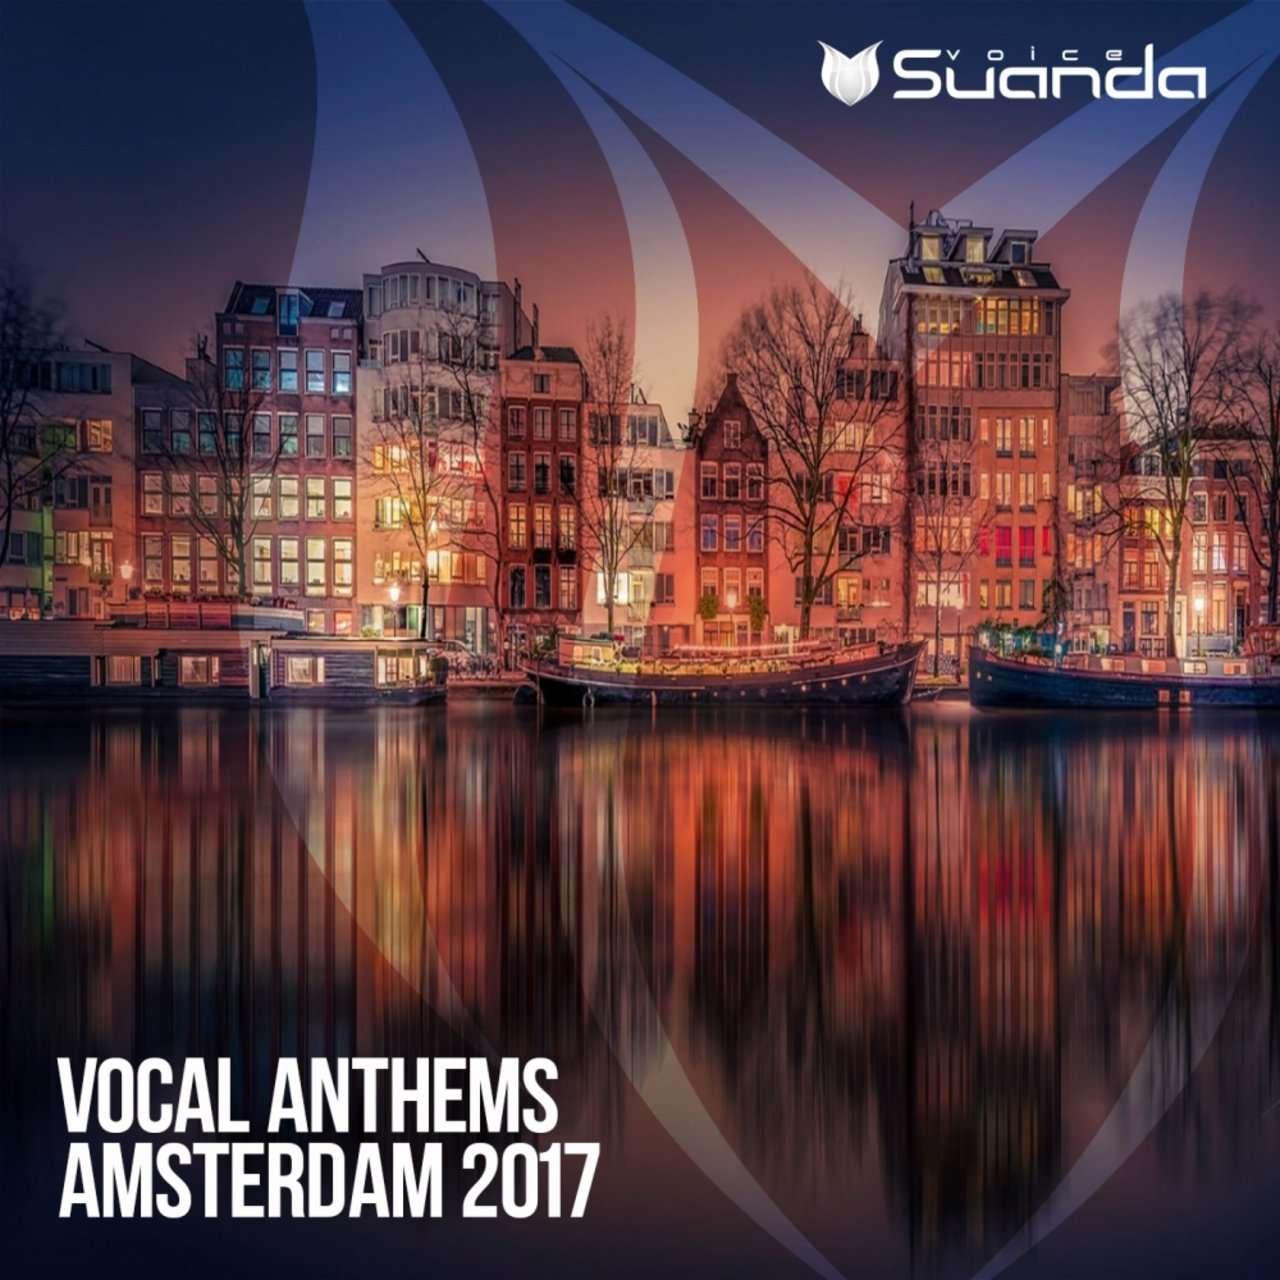 Suanda Voice《Vocal Anthems Amsterdam 2017》[CD级无损/44.1kHz/16bit]